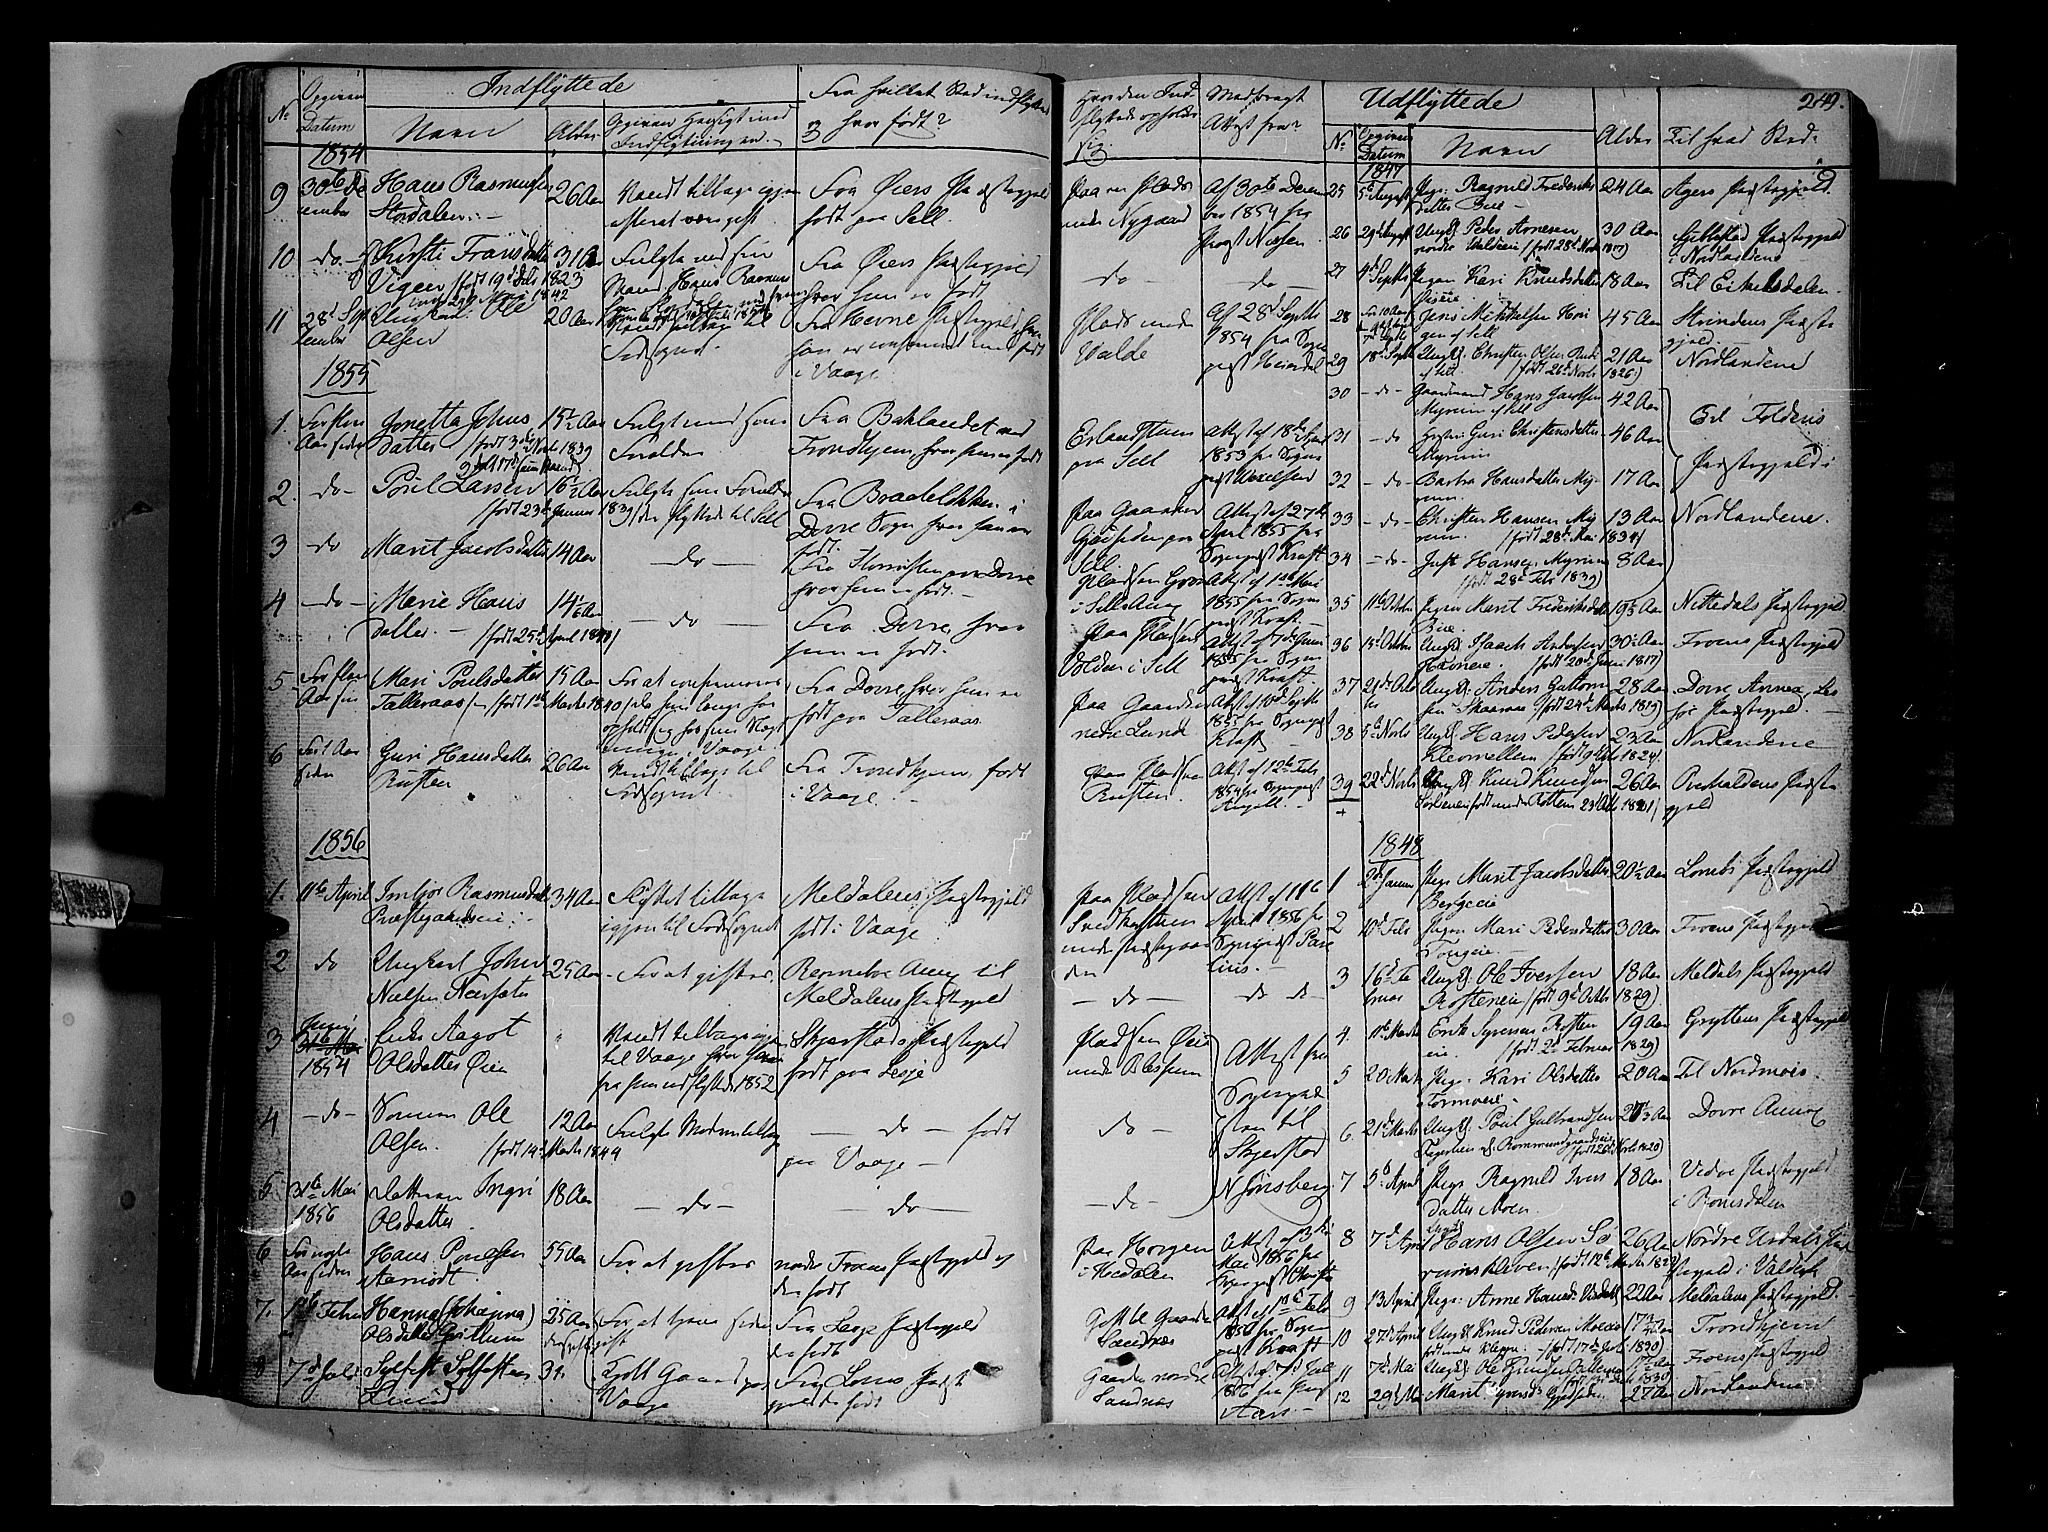 SAH, Vågå prestekontor, Ministerialbok nr. 5 /1, 1842-1856, s. 249